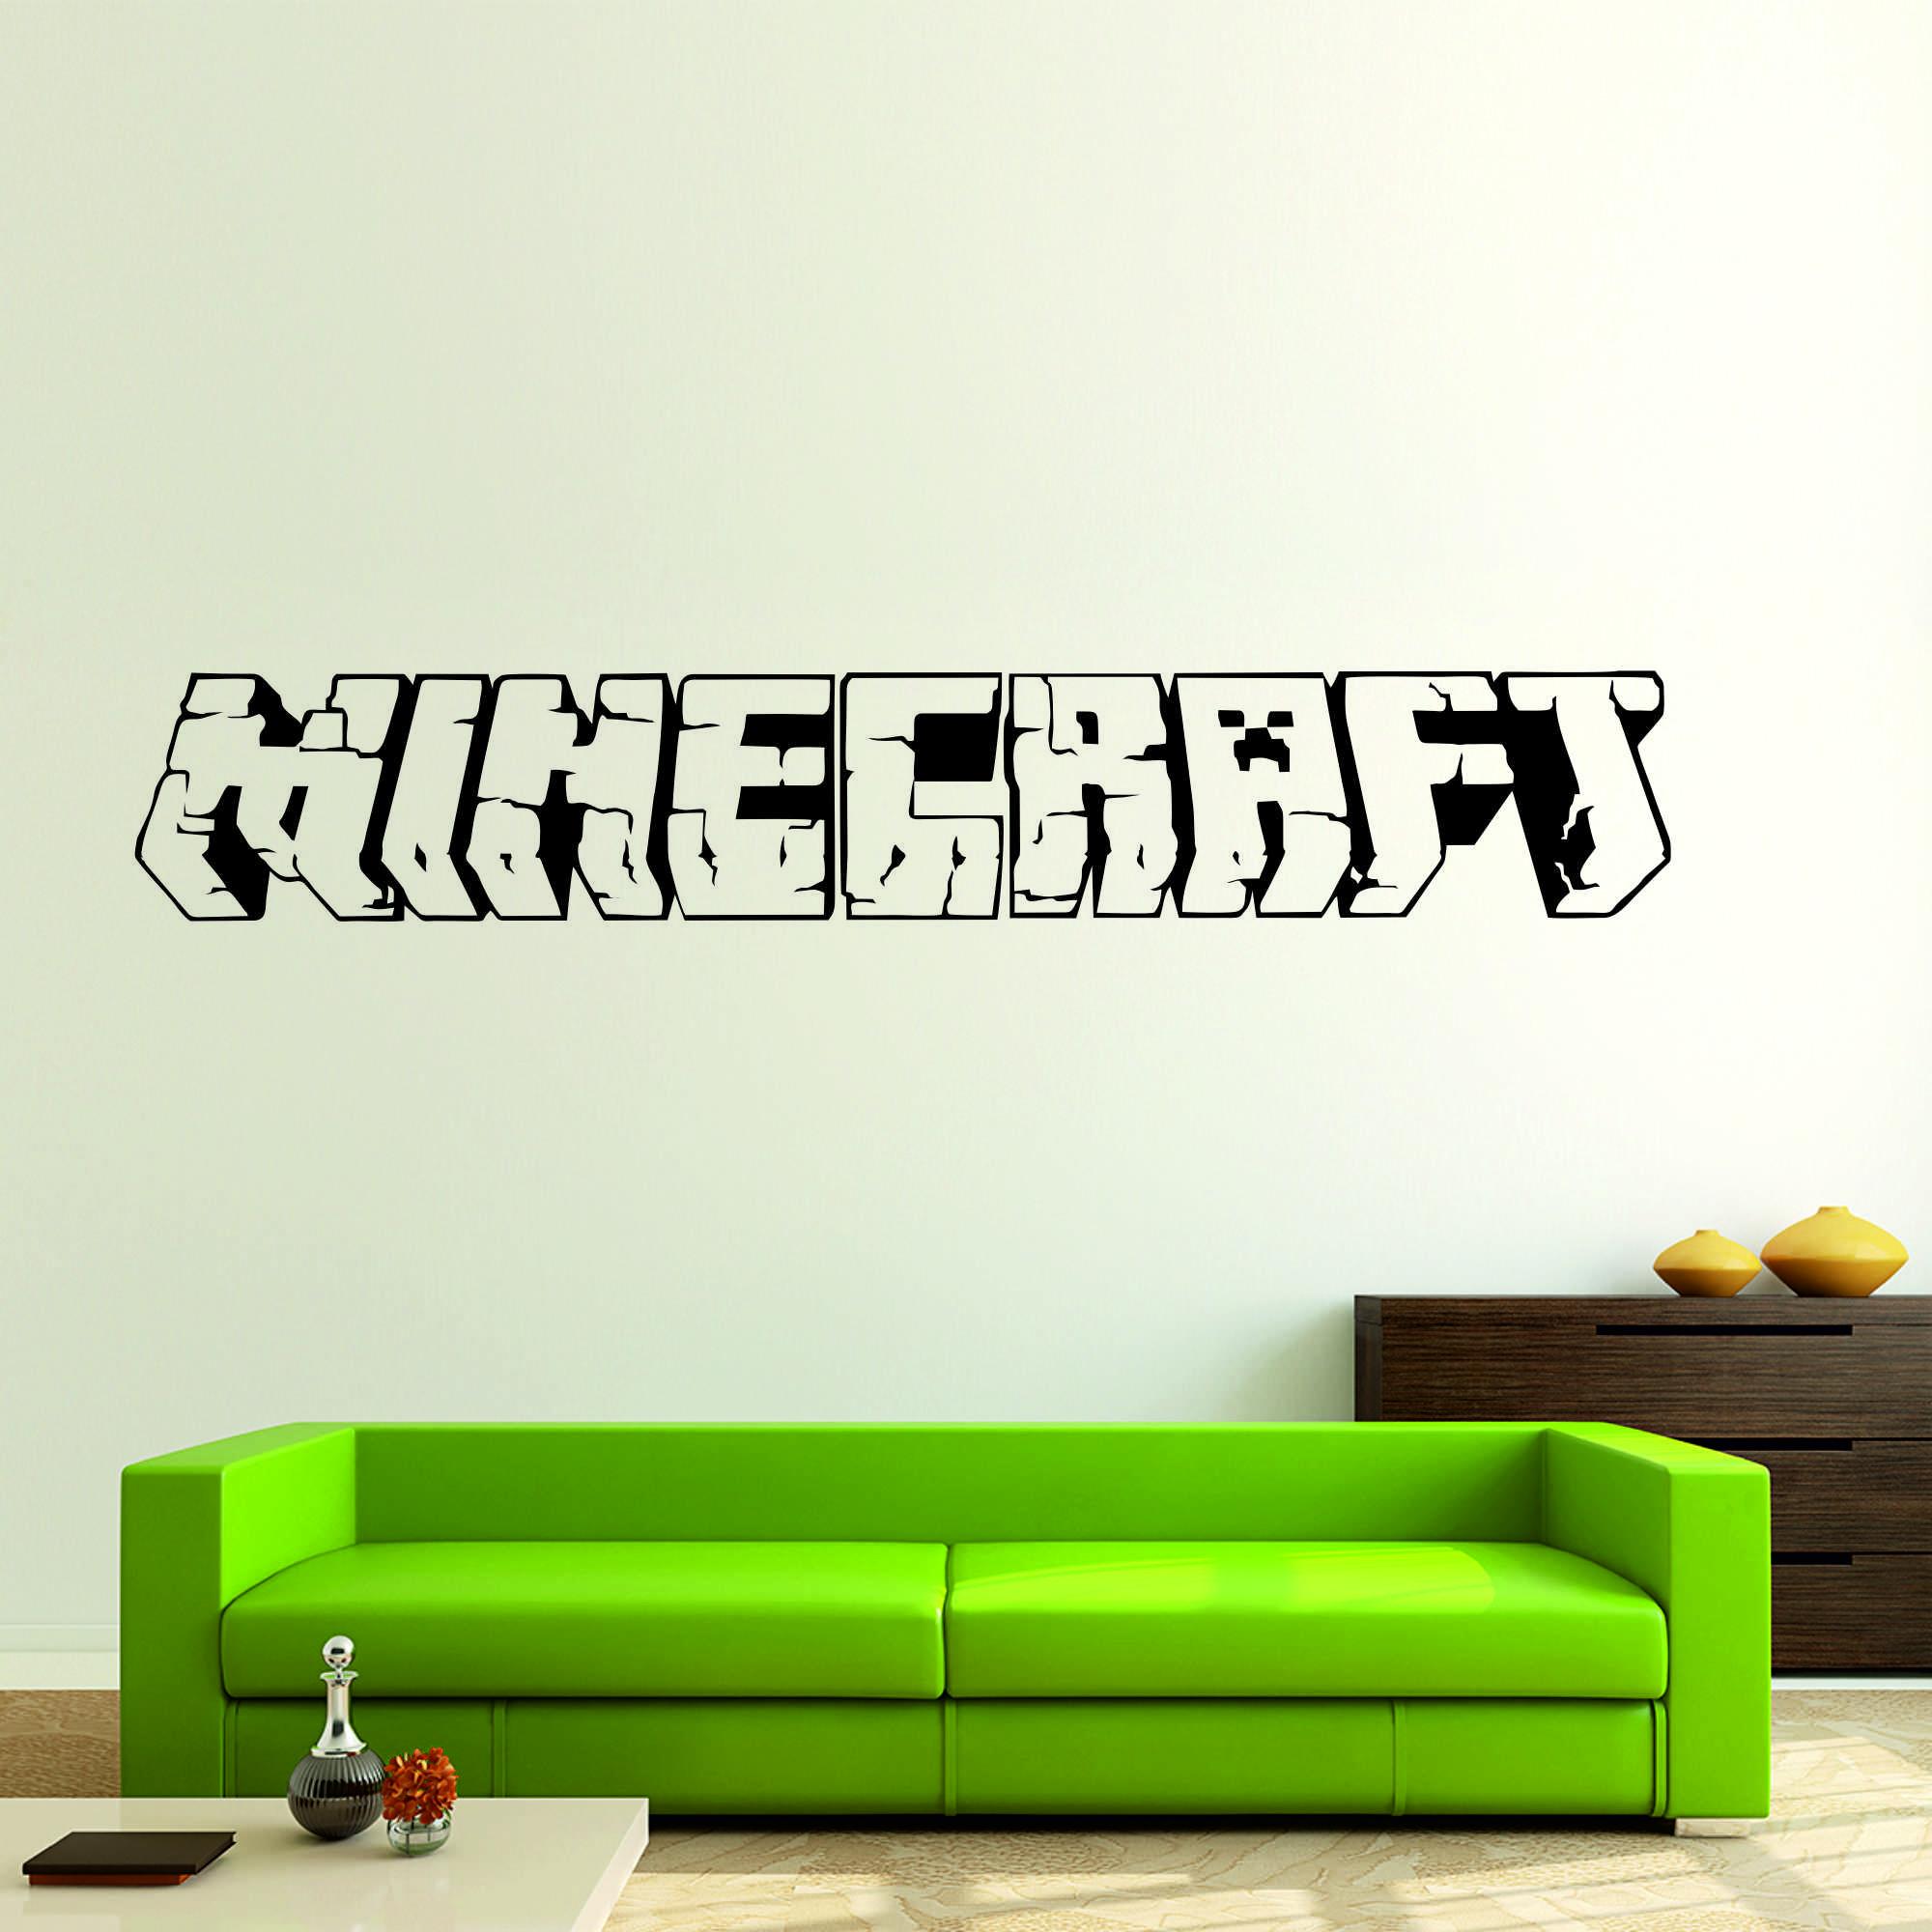 Samolepka na zeď - Minecraft nápis - 95x16 cm - PopyDesign